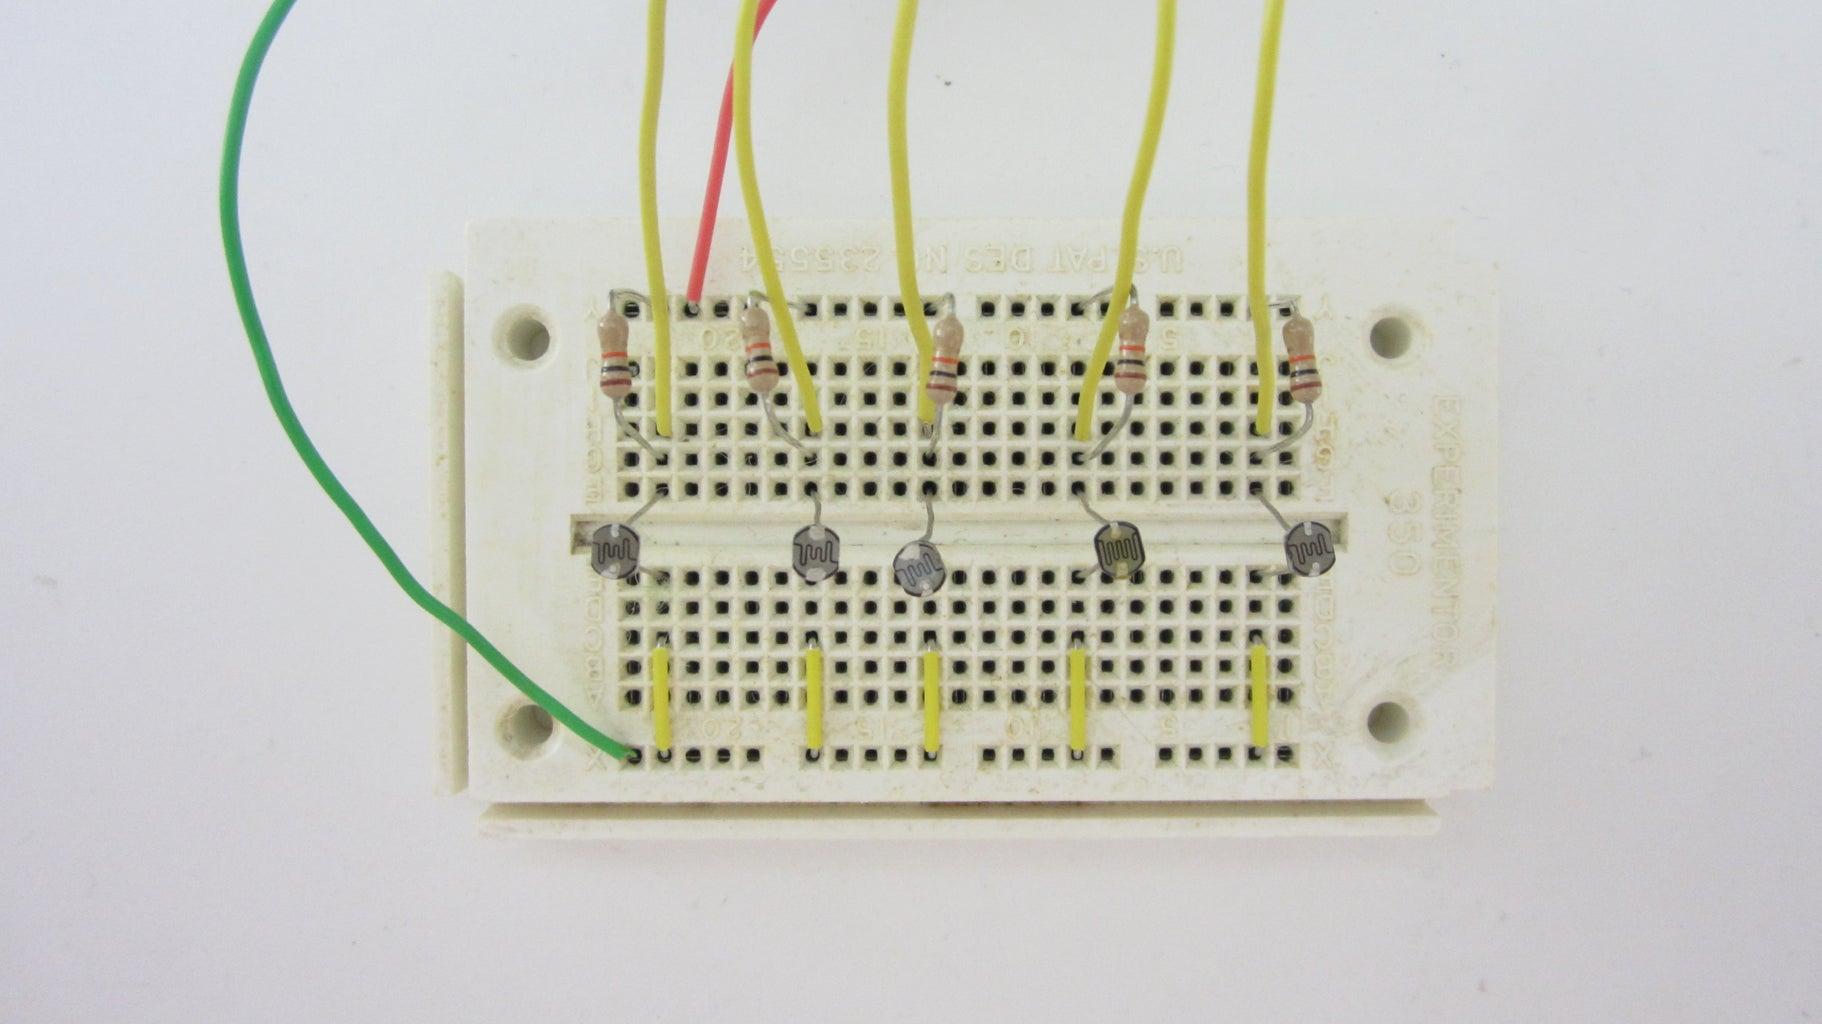 Setup the Light Sensor Array on a Breadboard